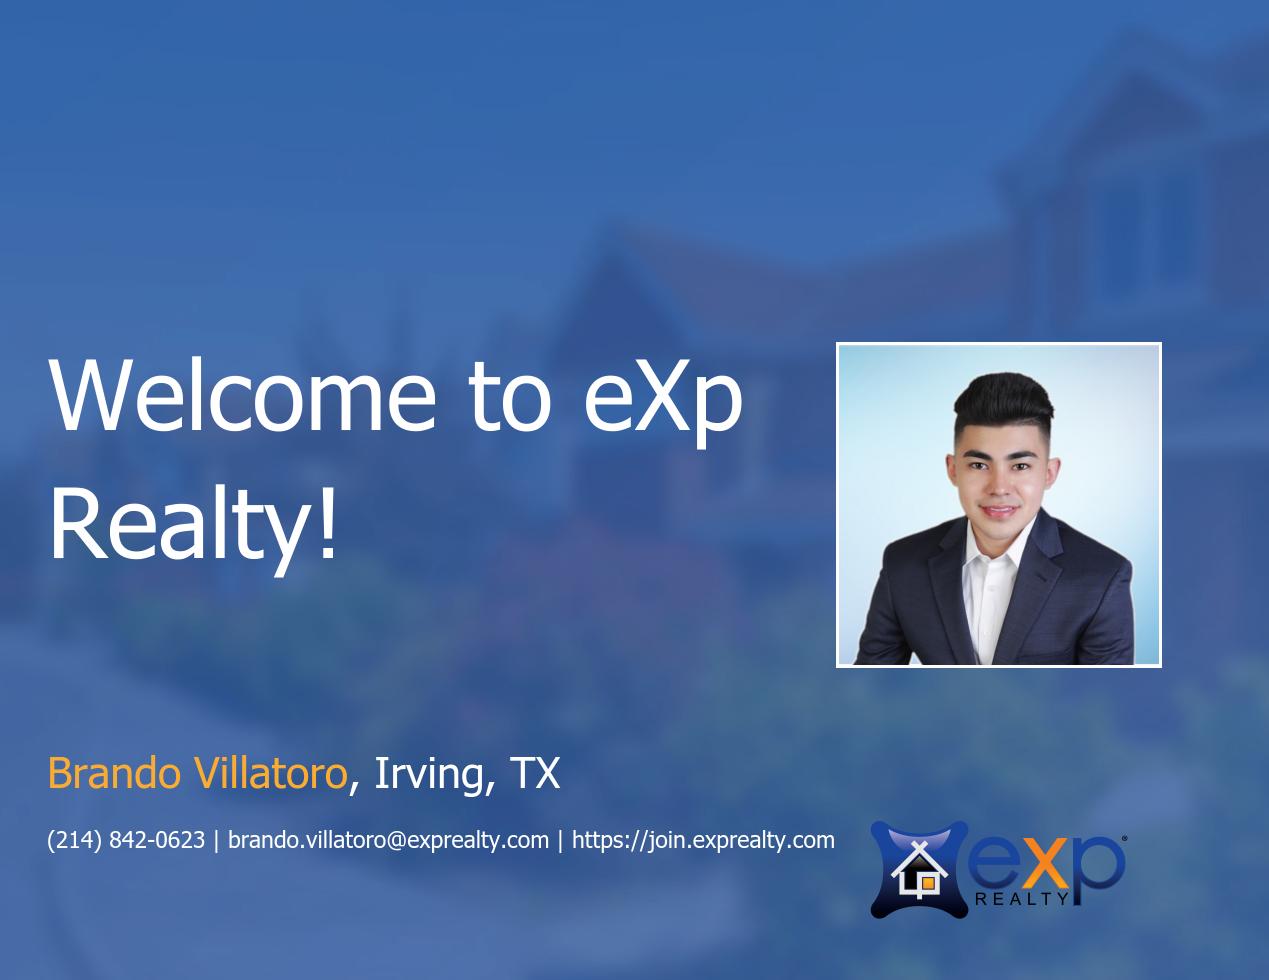 Brando Villatoro Joined eXp Realty!